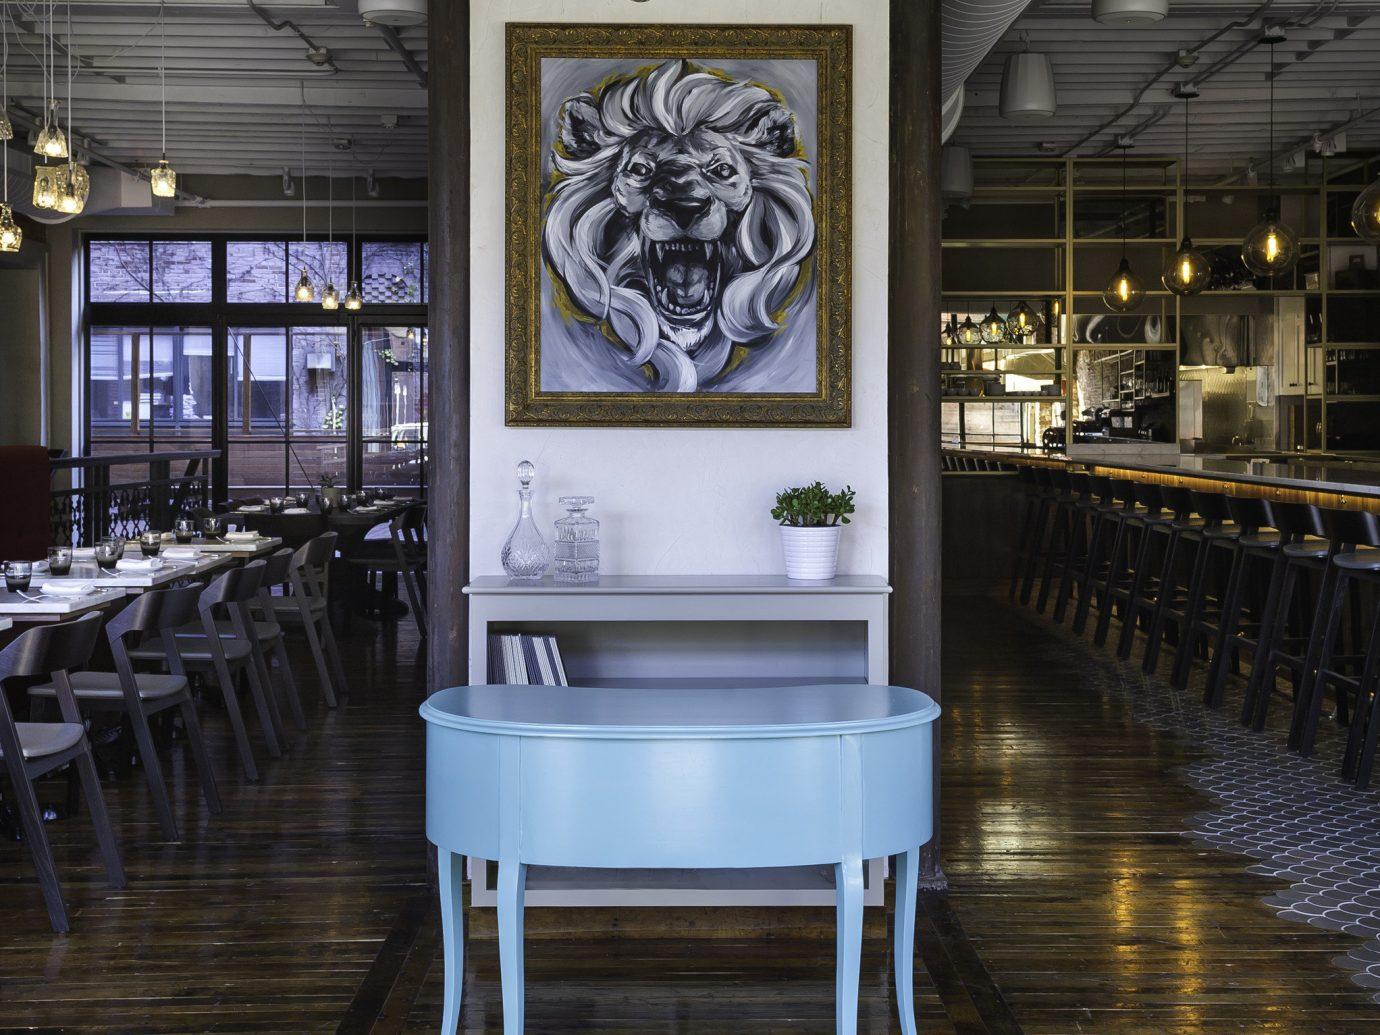 Food + Drink floor indoor furniture interior design Lobby flooring table chair area